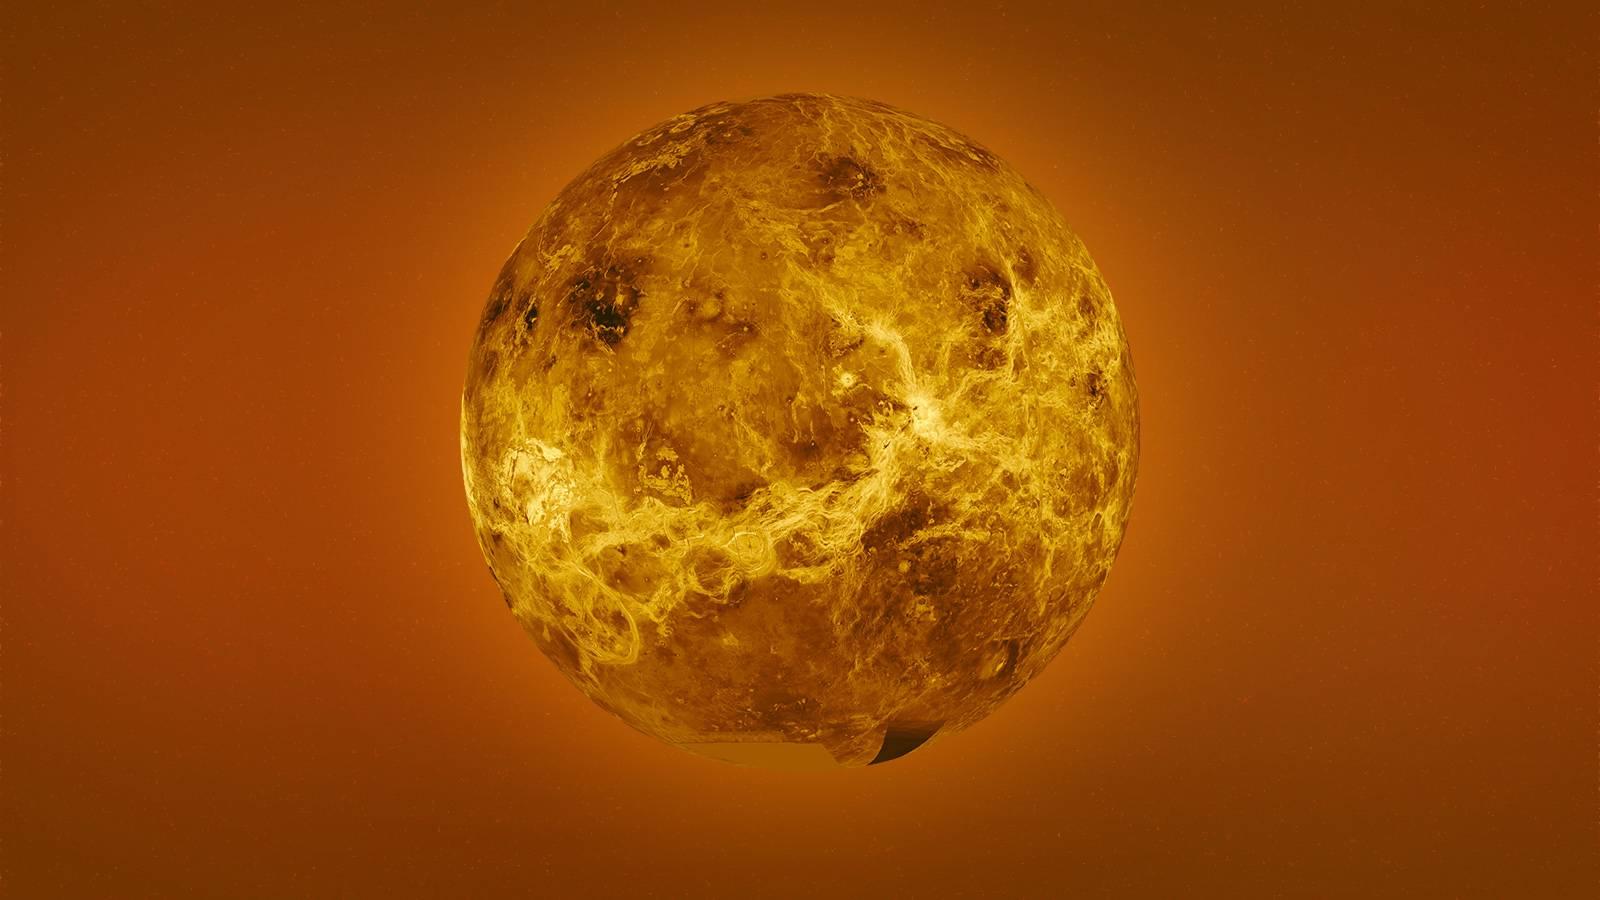 Planeta Venus continente